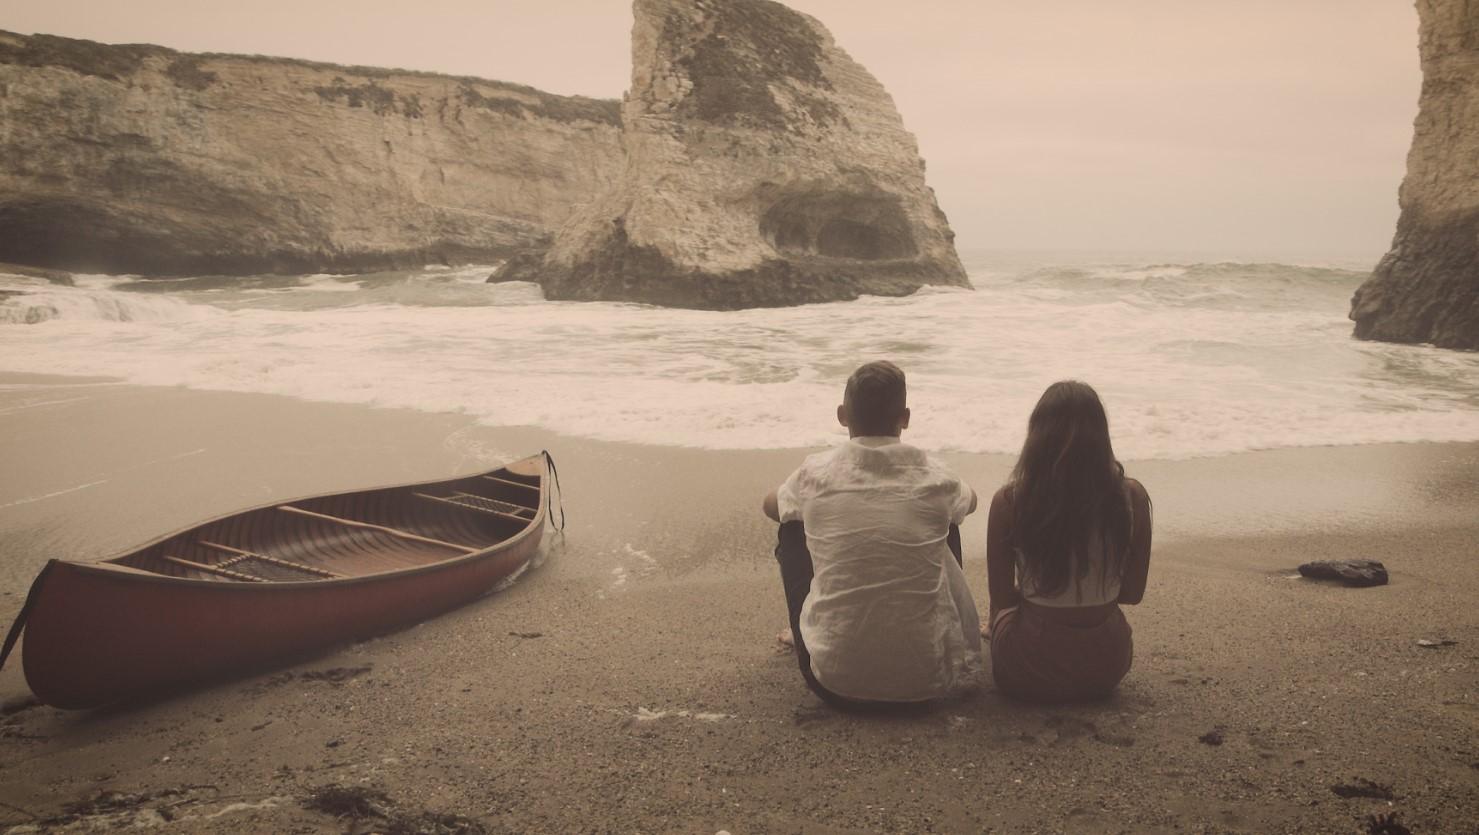 Life music video